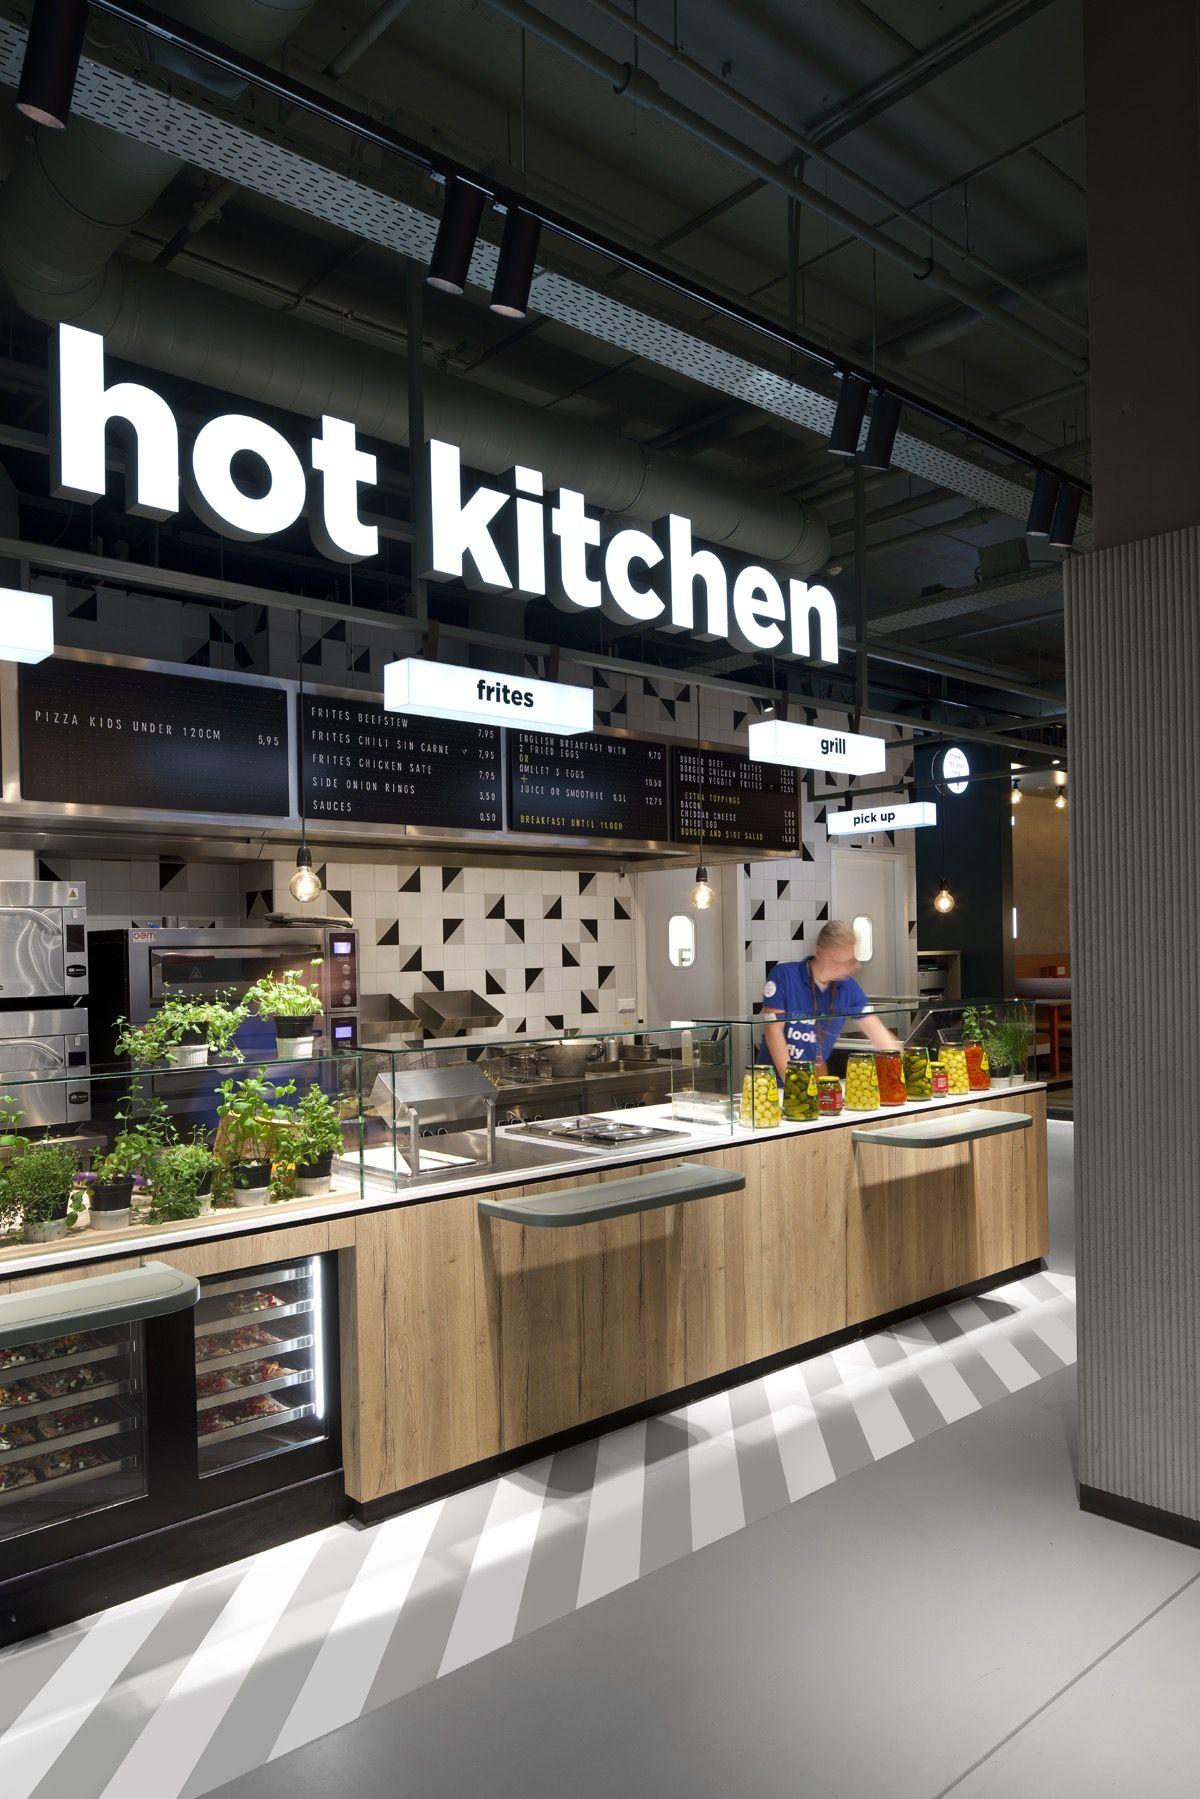 Housing Market Predictions 2021 Will It Crash In 2021 Or 2022 Food Court Design Cafe Interior Design Restaurant Interior Design